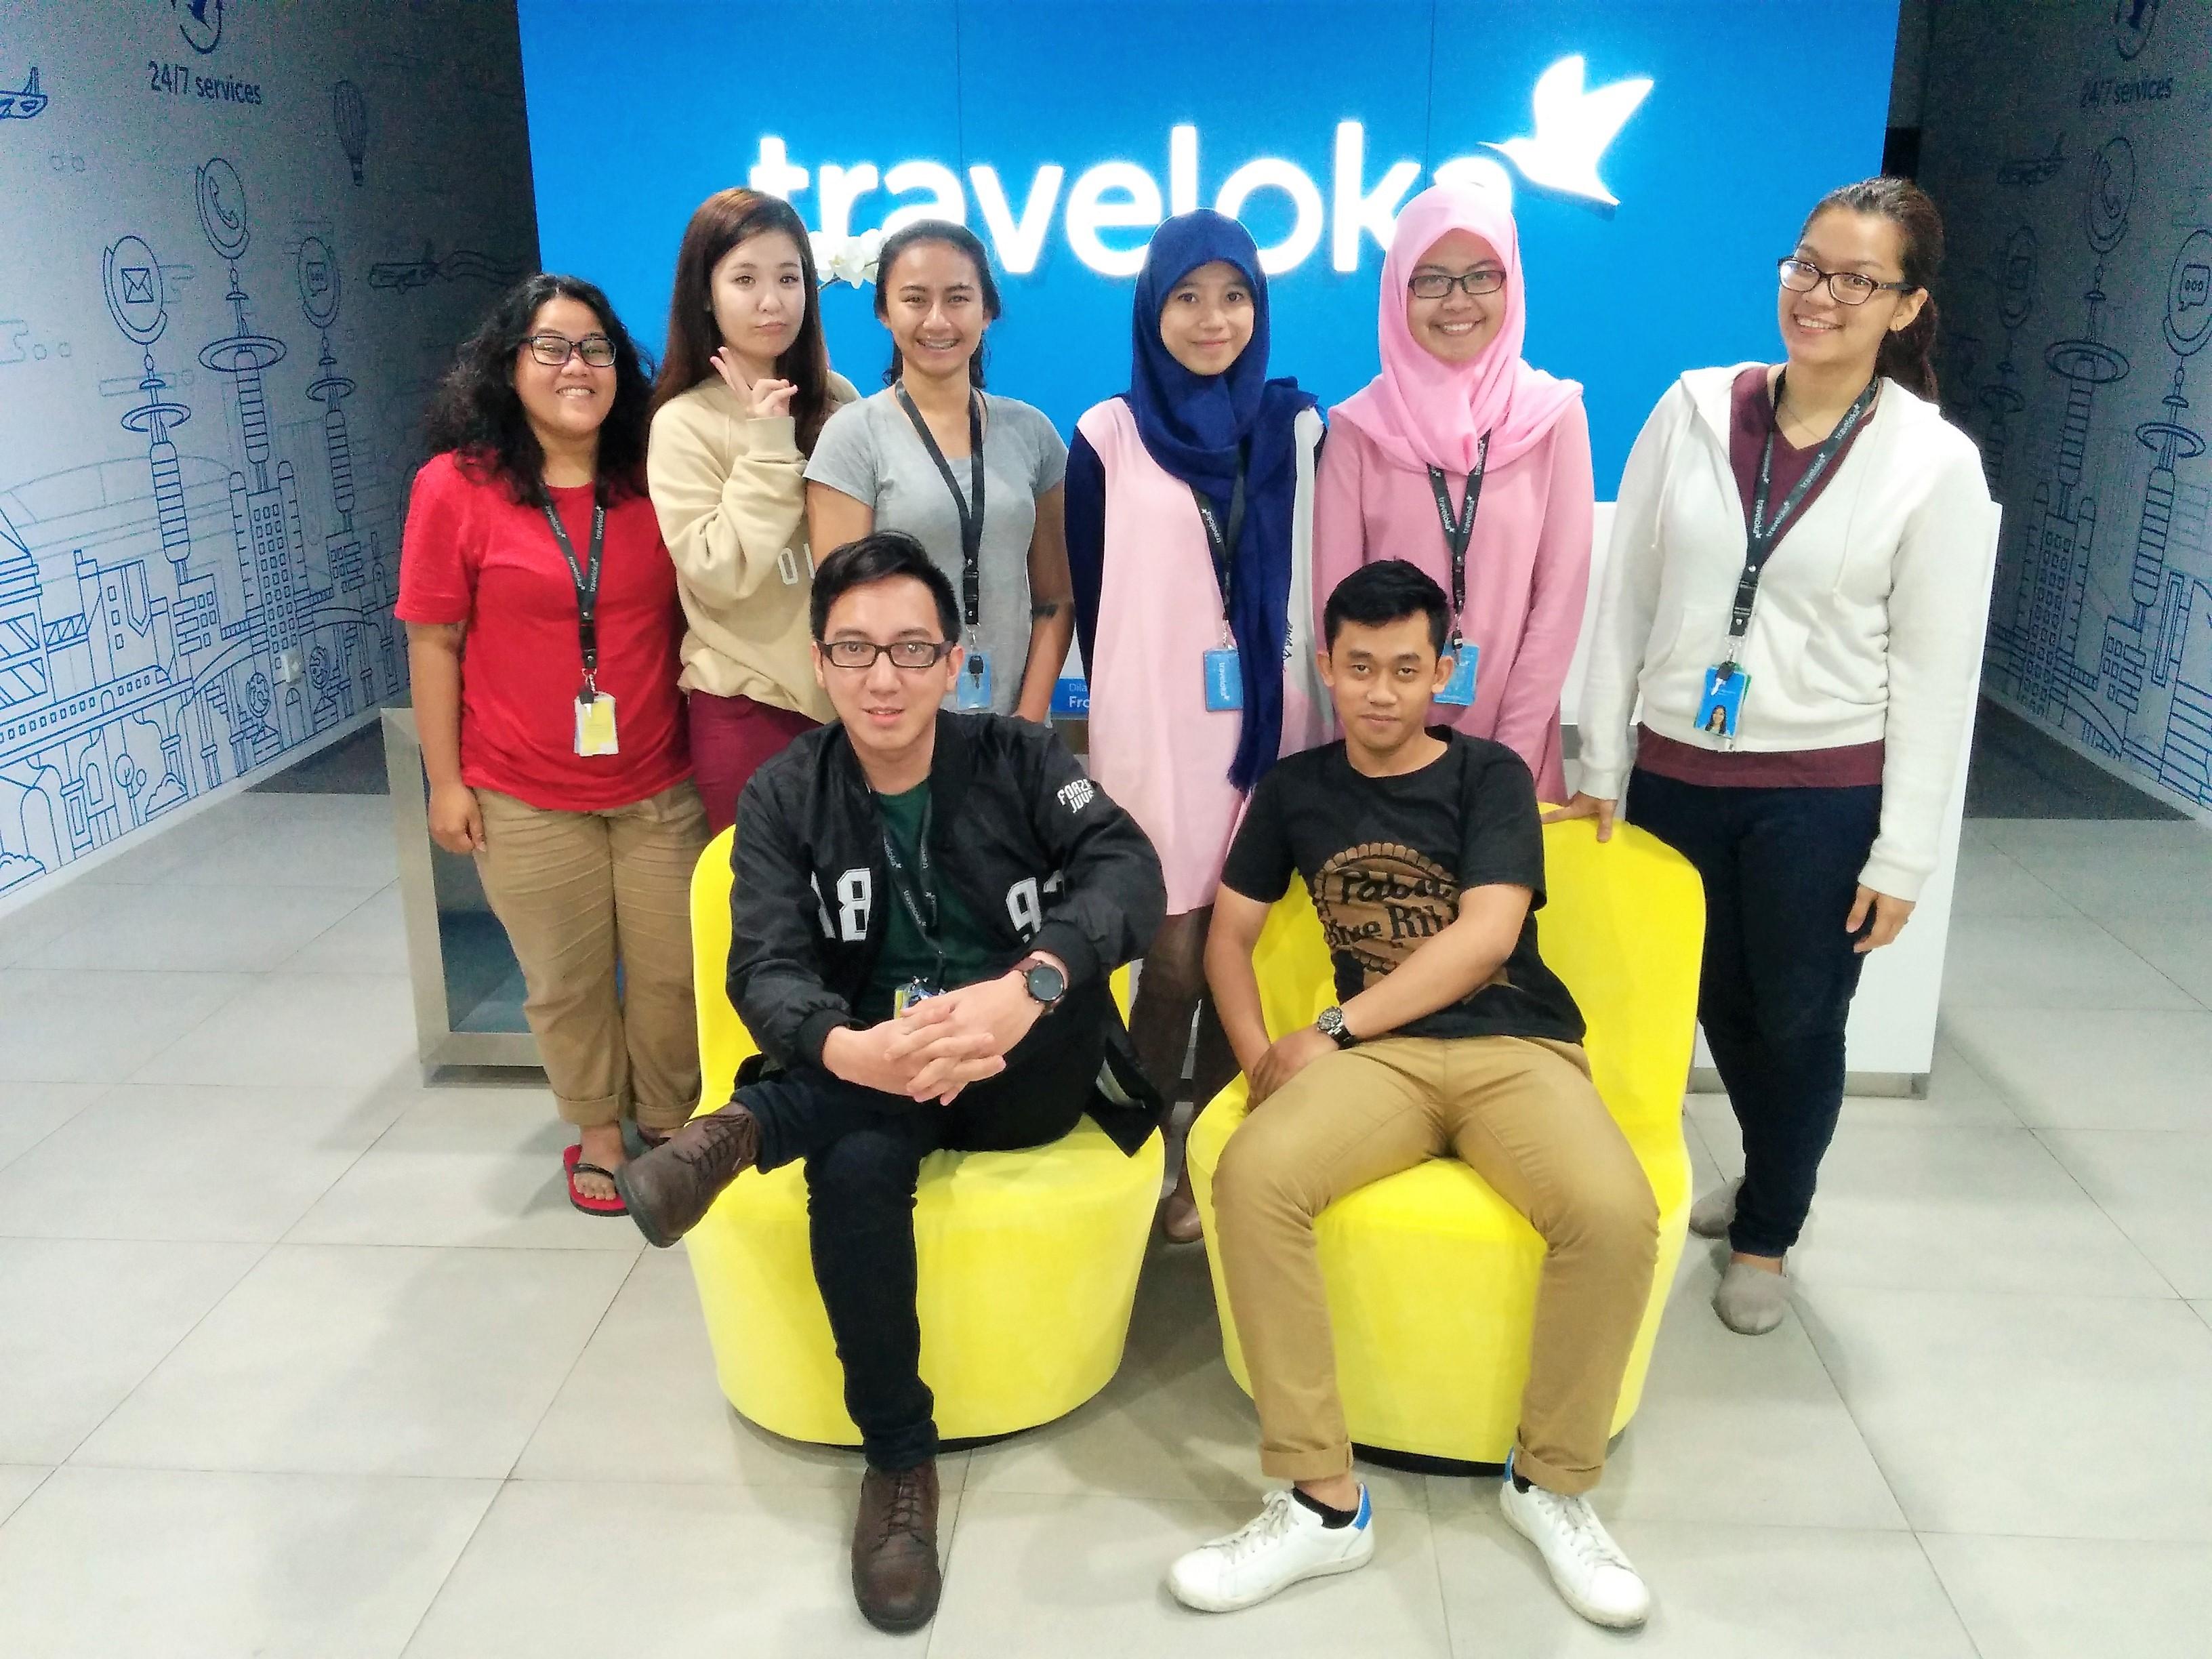 Buatlah Sendiri Kelas Percakapan Bahasa Inggris Anda di Medan